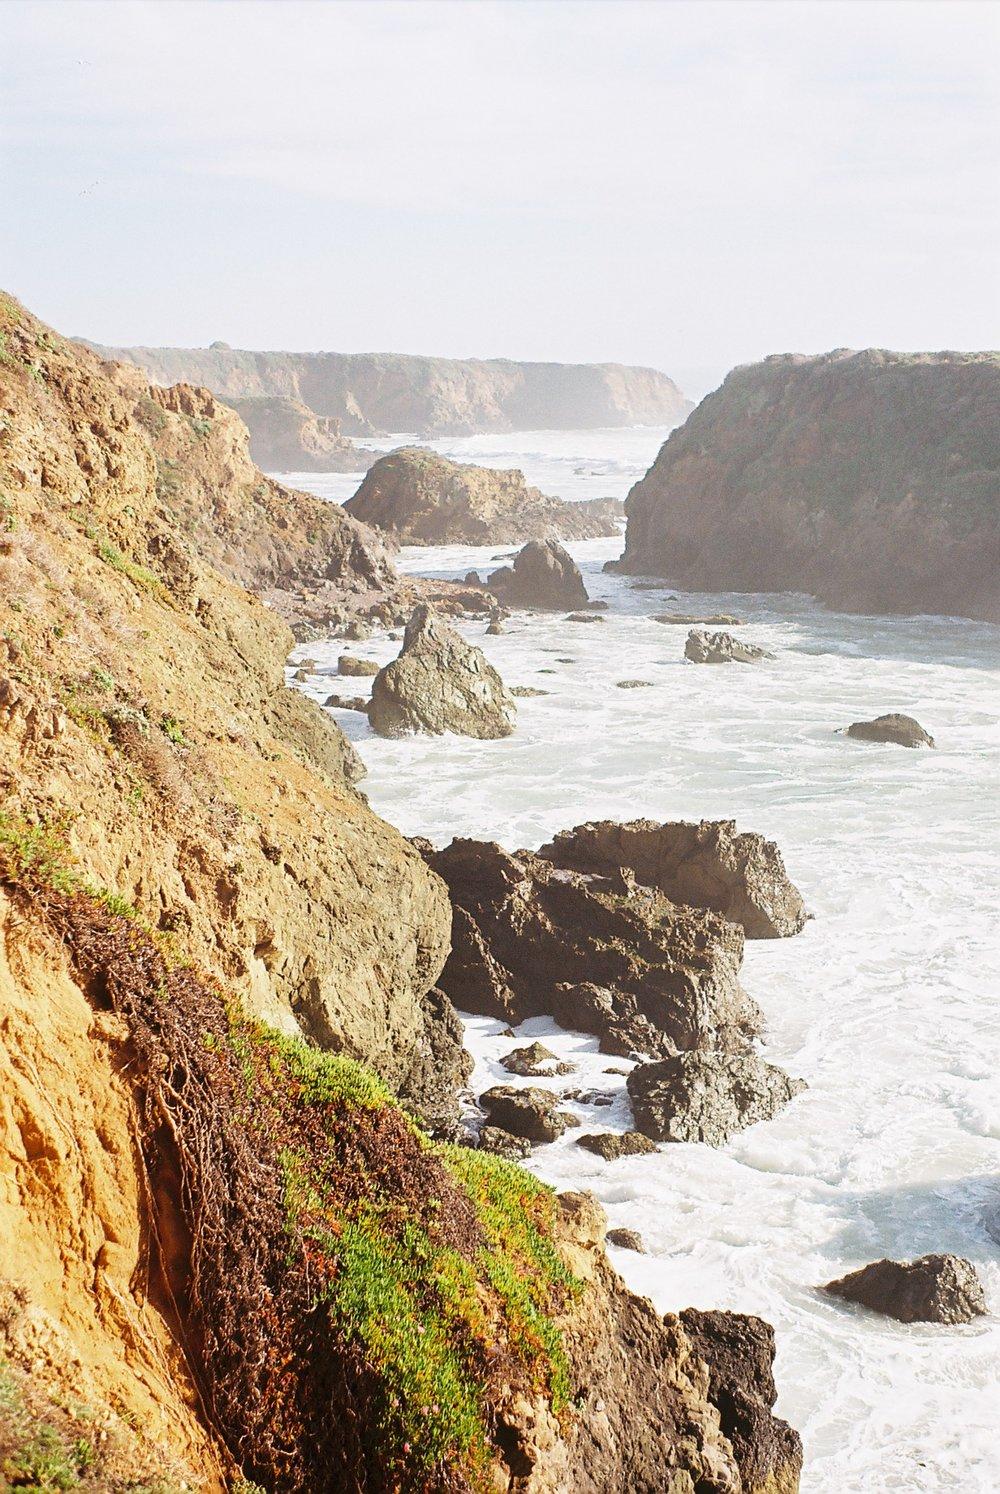 Cliffs 4 Highway 1 California Analogue Travel Photographer